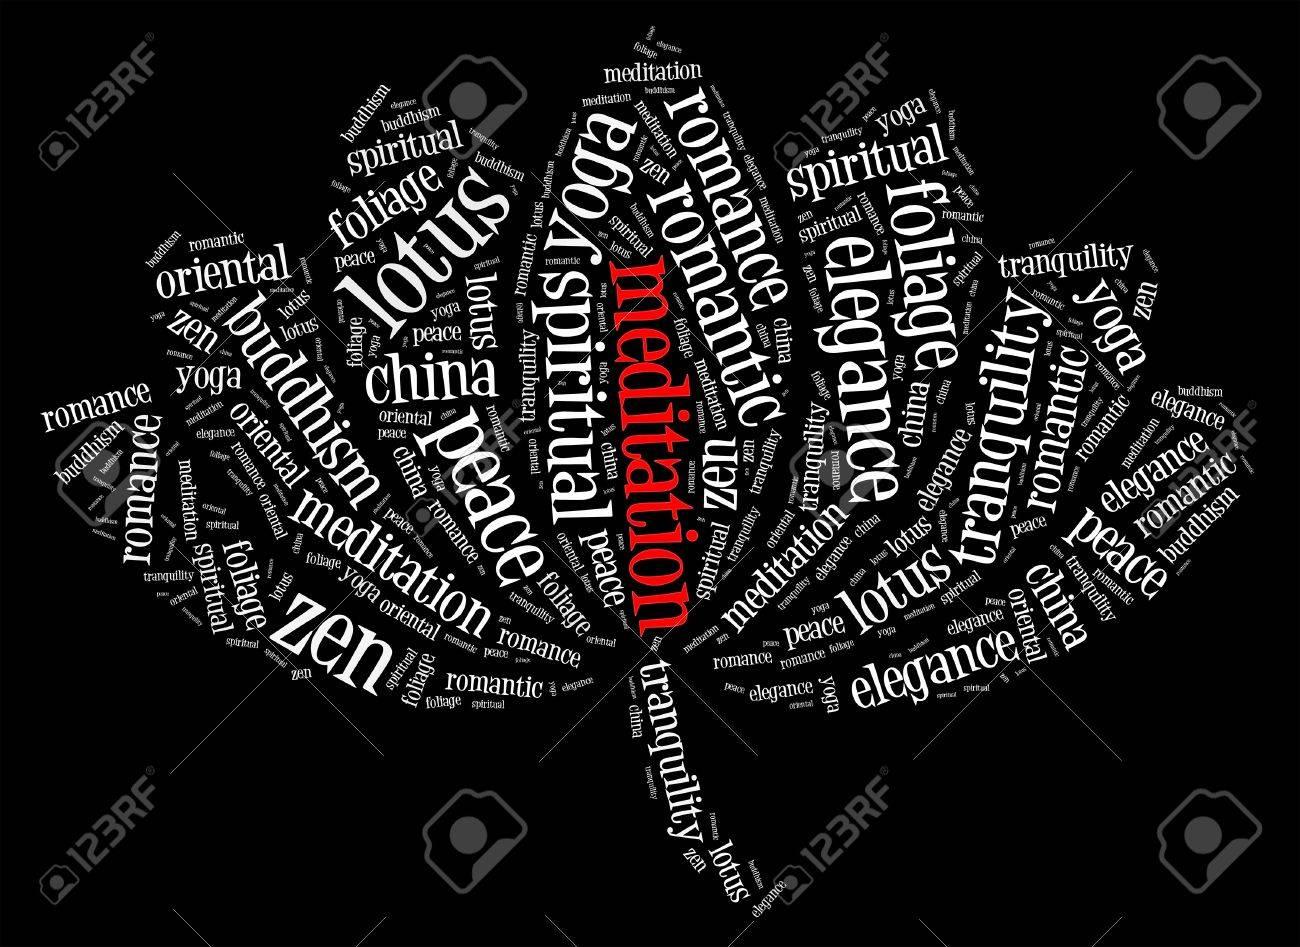 Meditation and spiritual world info text graphics and arrangement meditation and spiritual world info text graphics and arrangement with lotus flower shape concept stock mightylinksfo